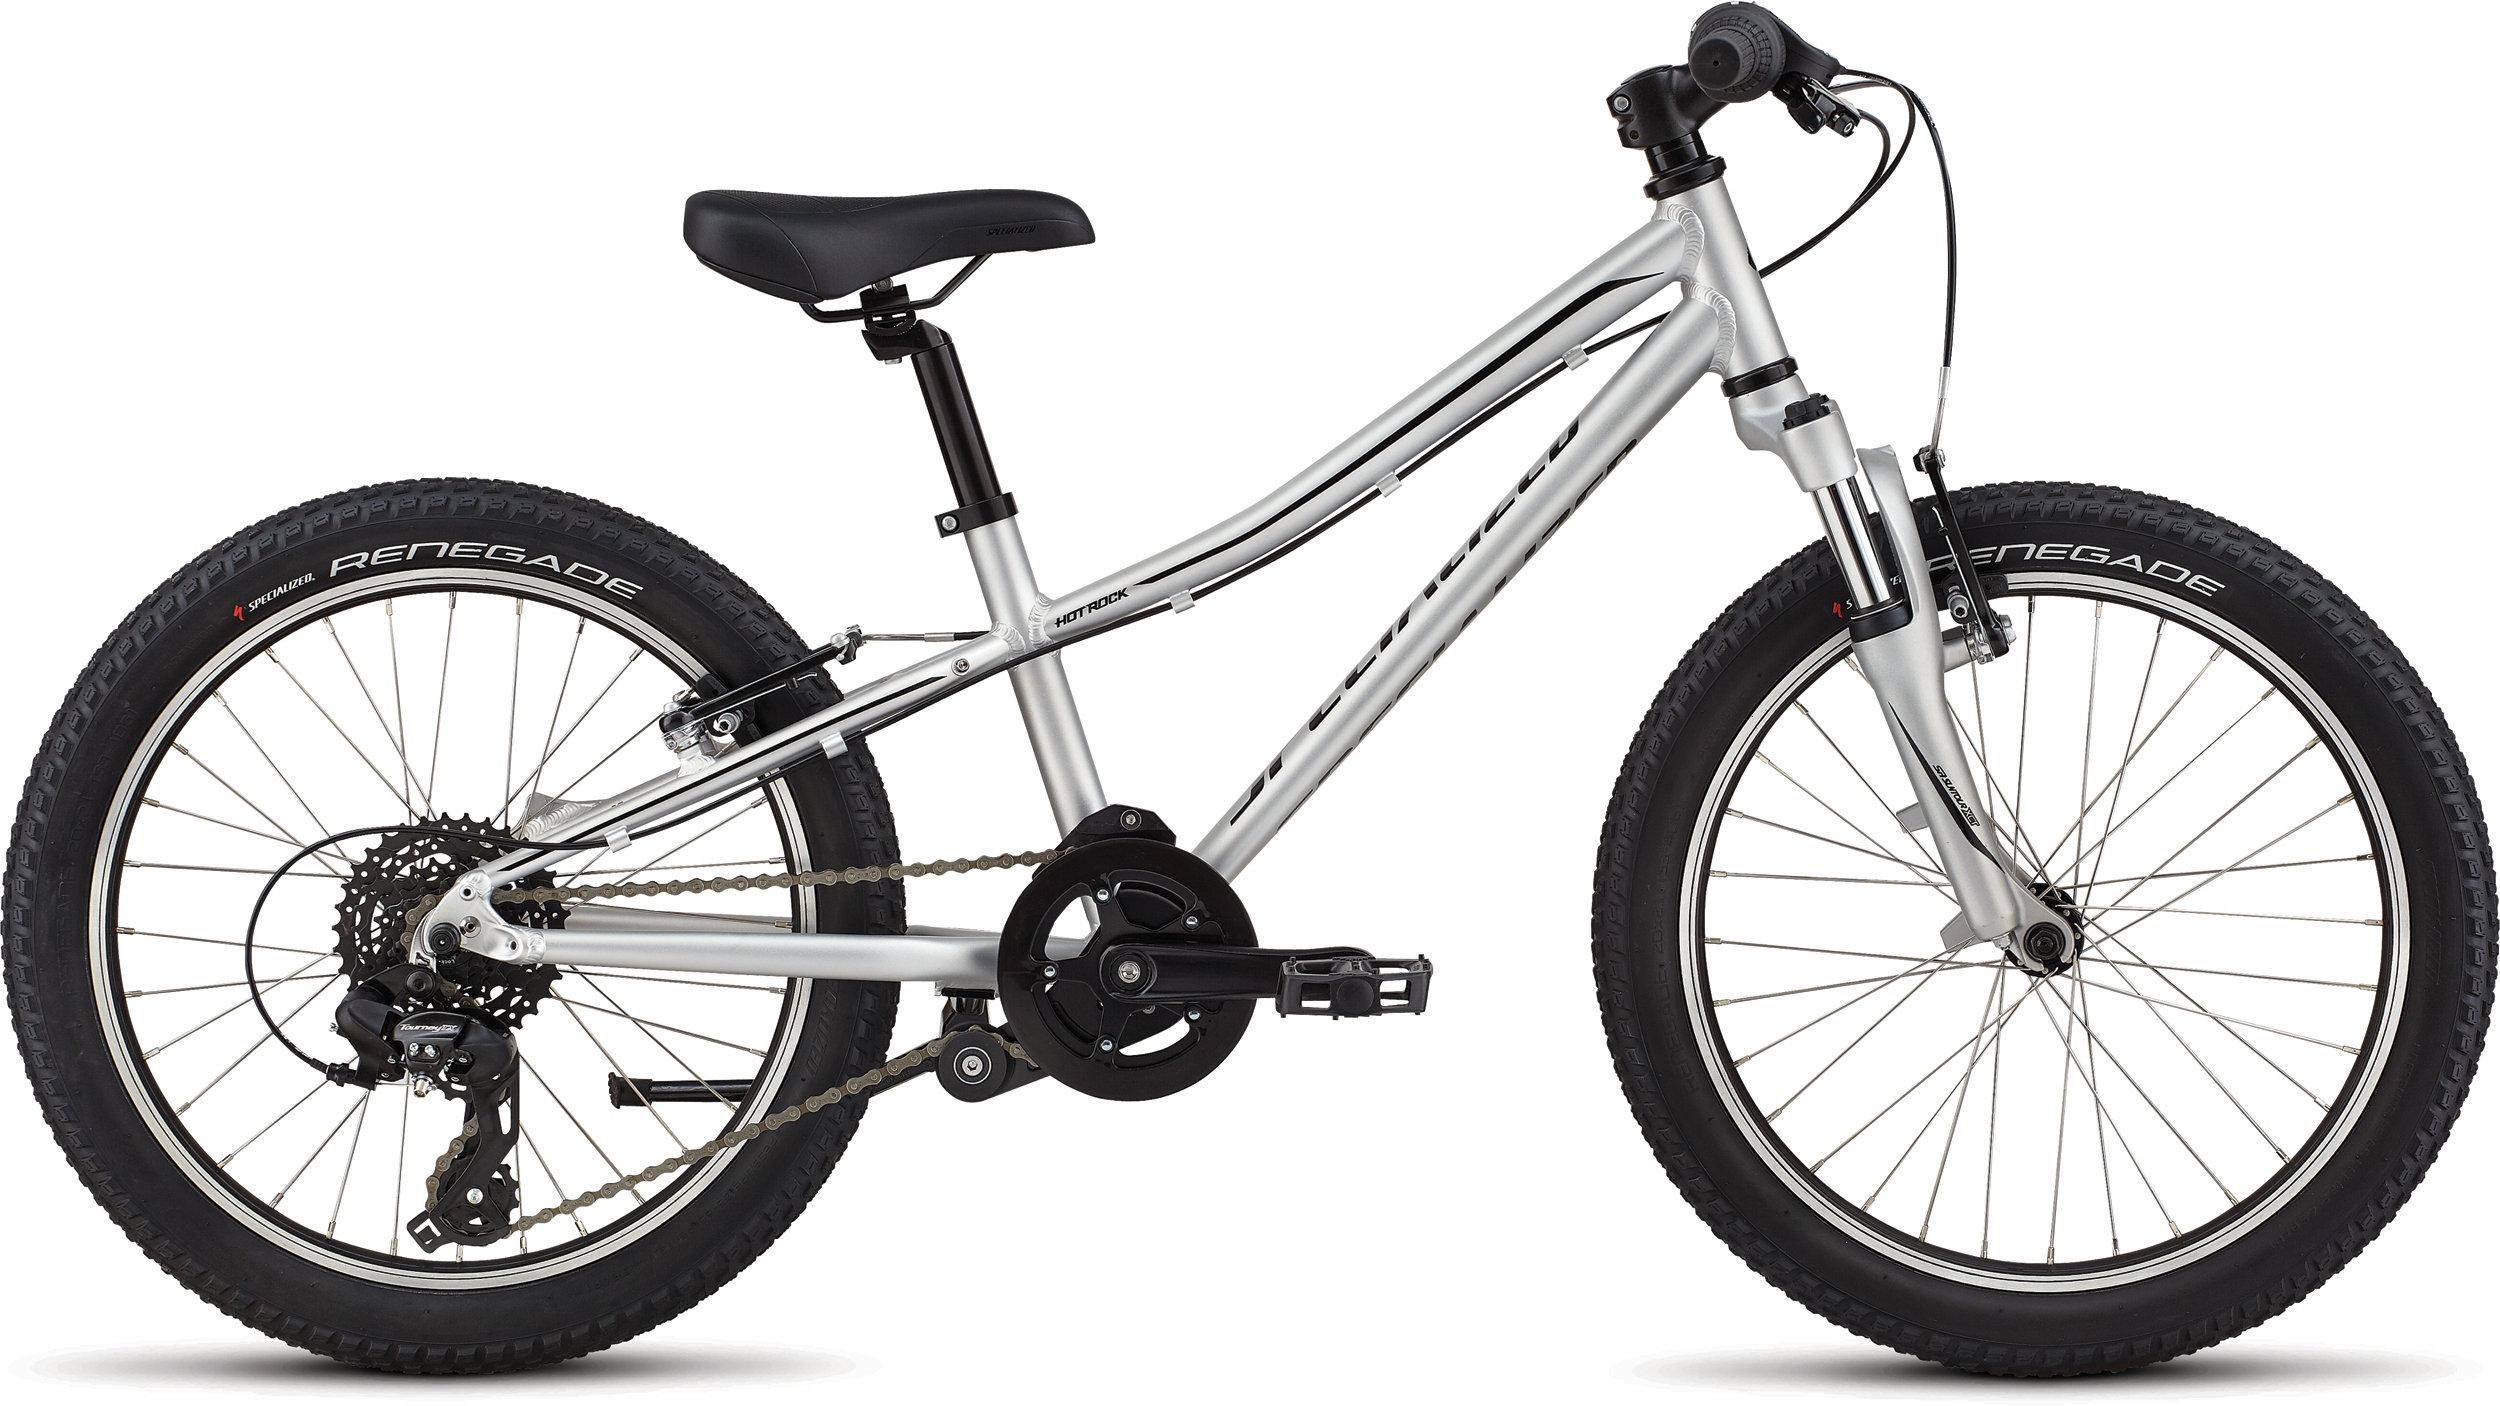 Specialized Hotrock 20 Satin Light Silver/Black 9 - Bike Maniac